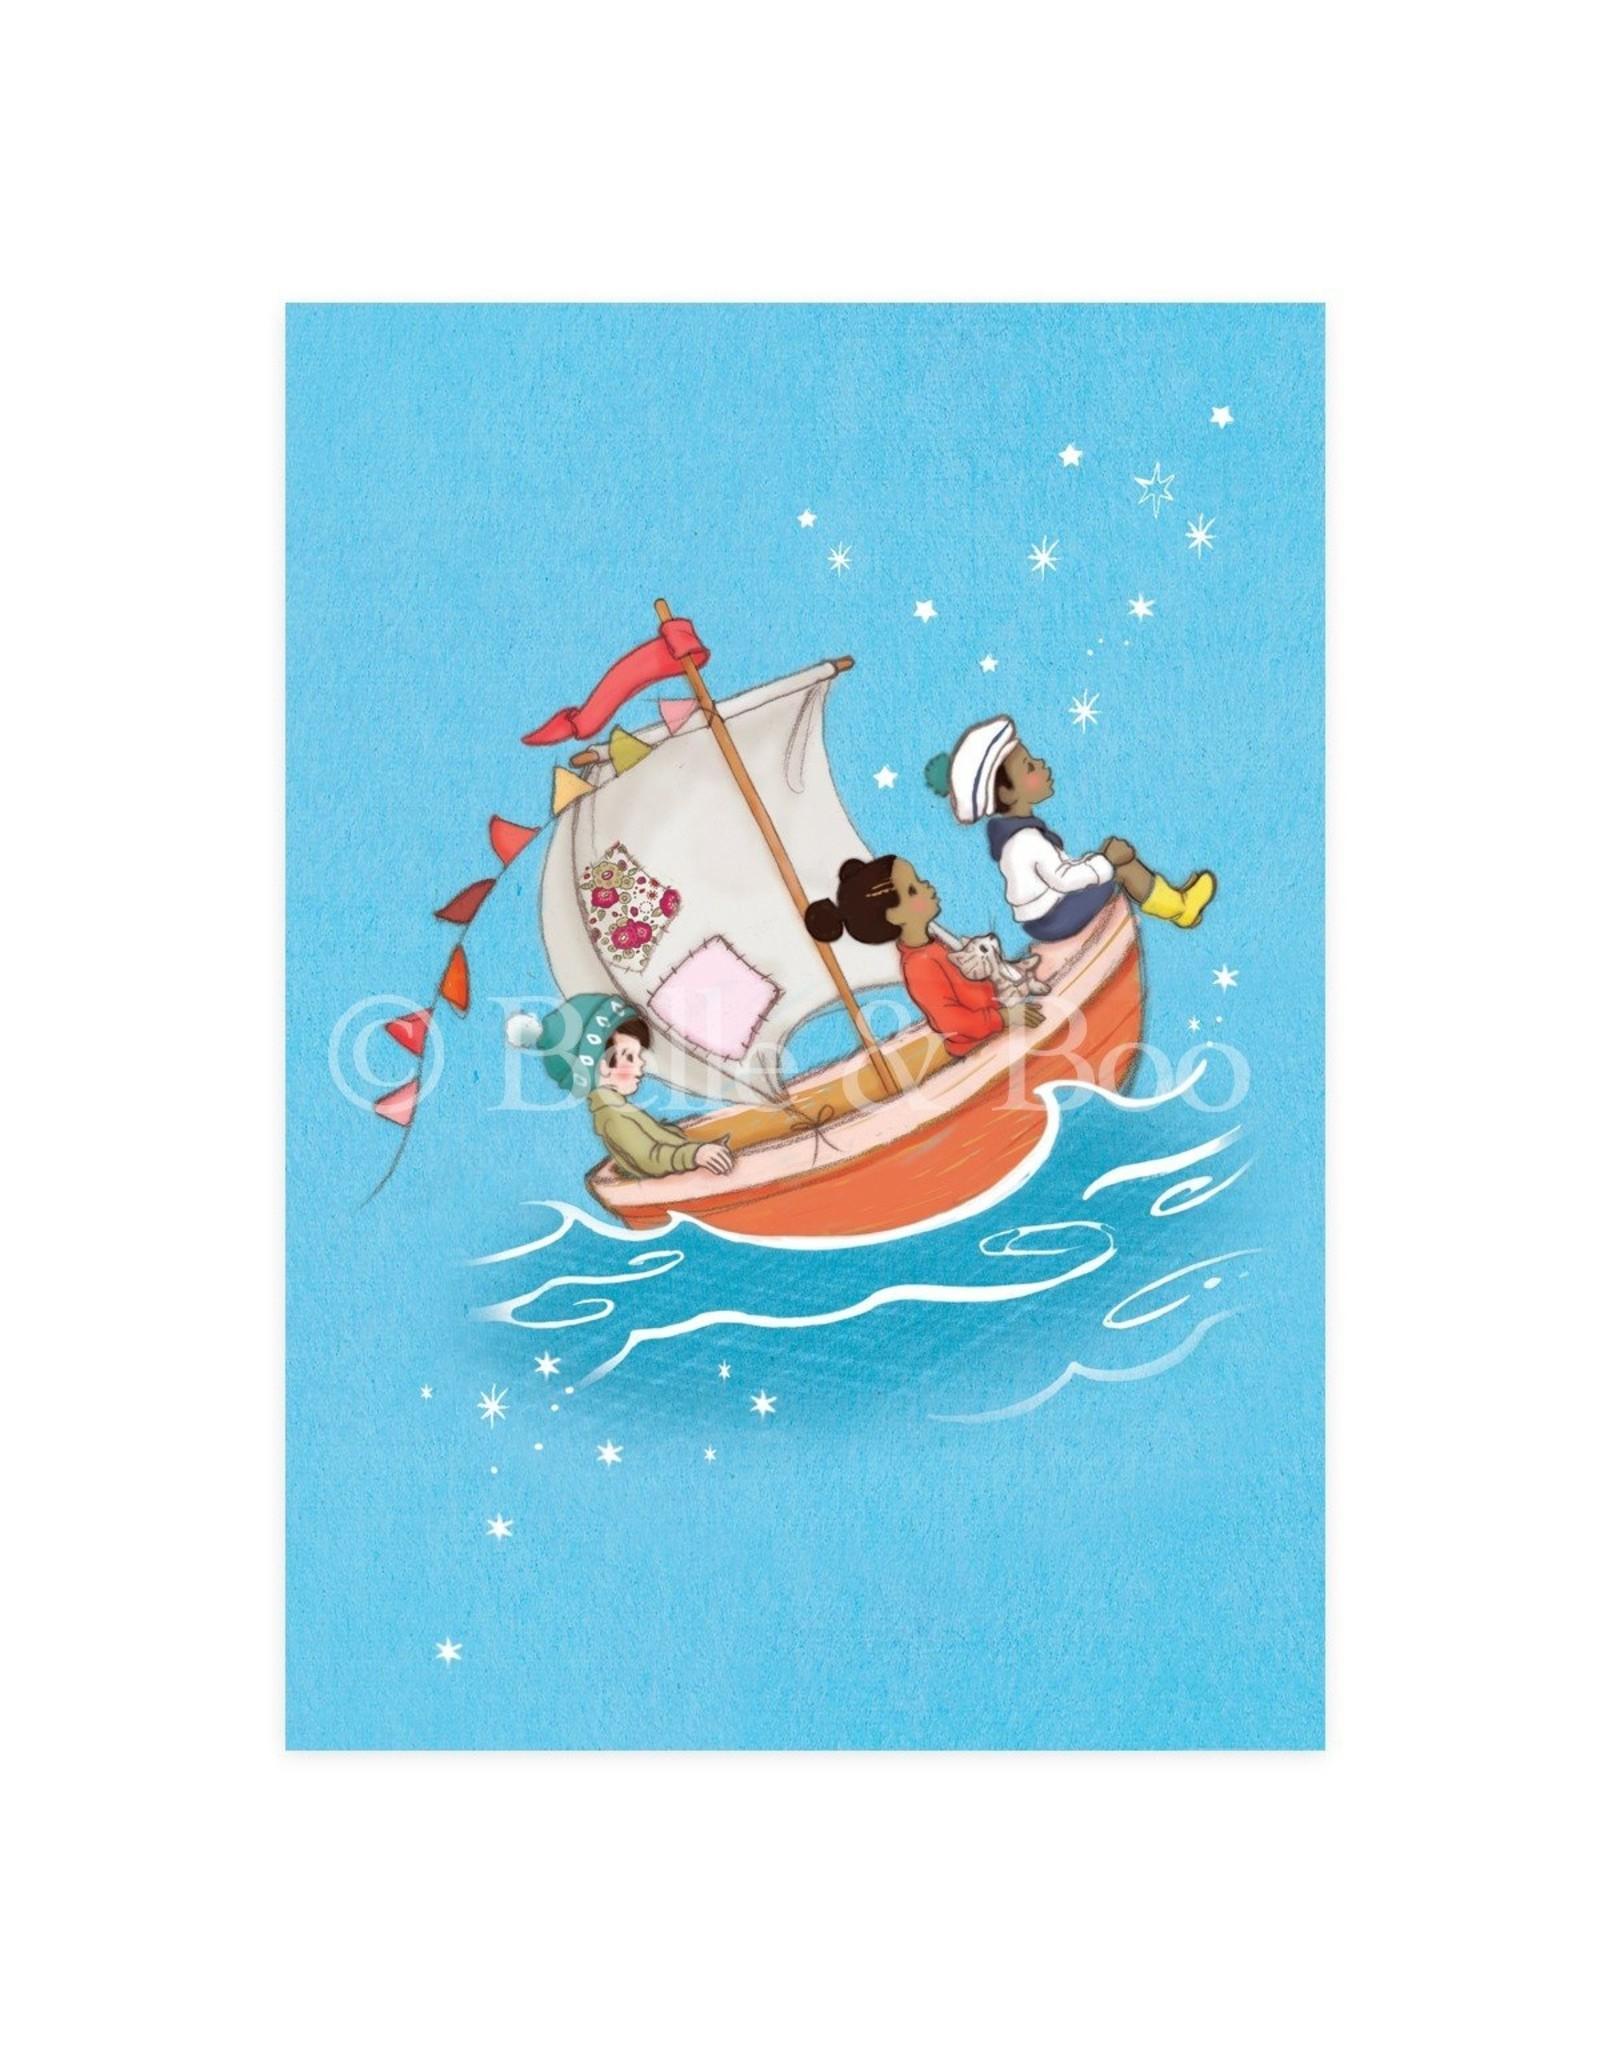 Belle & Boo card - sail boat dreams